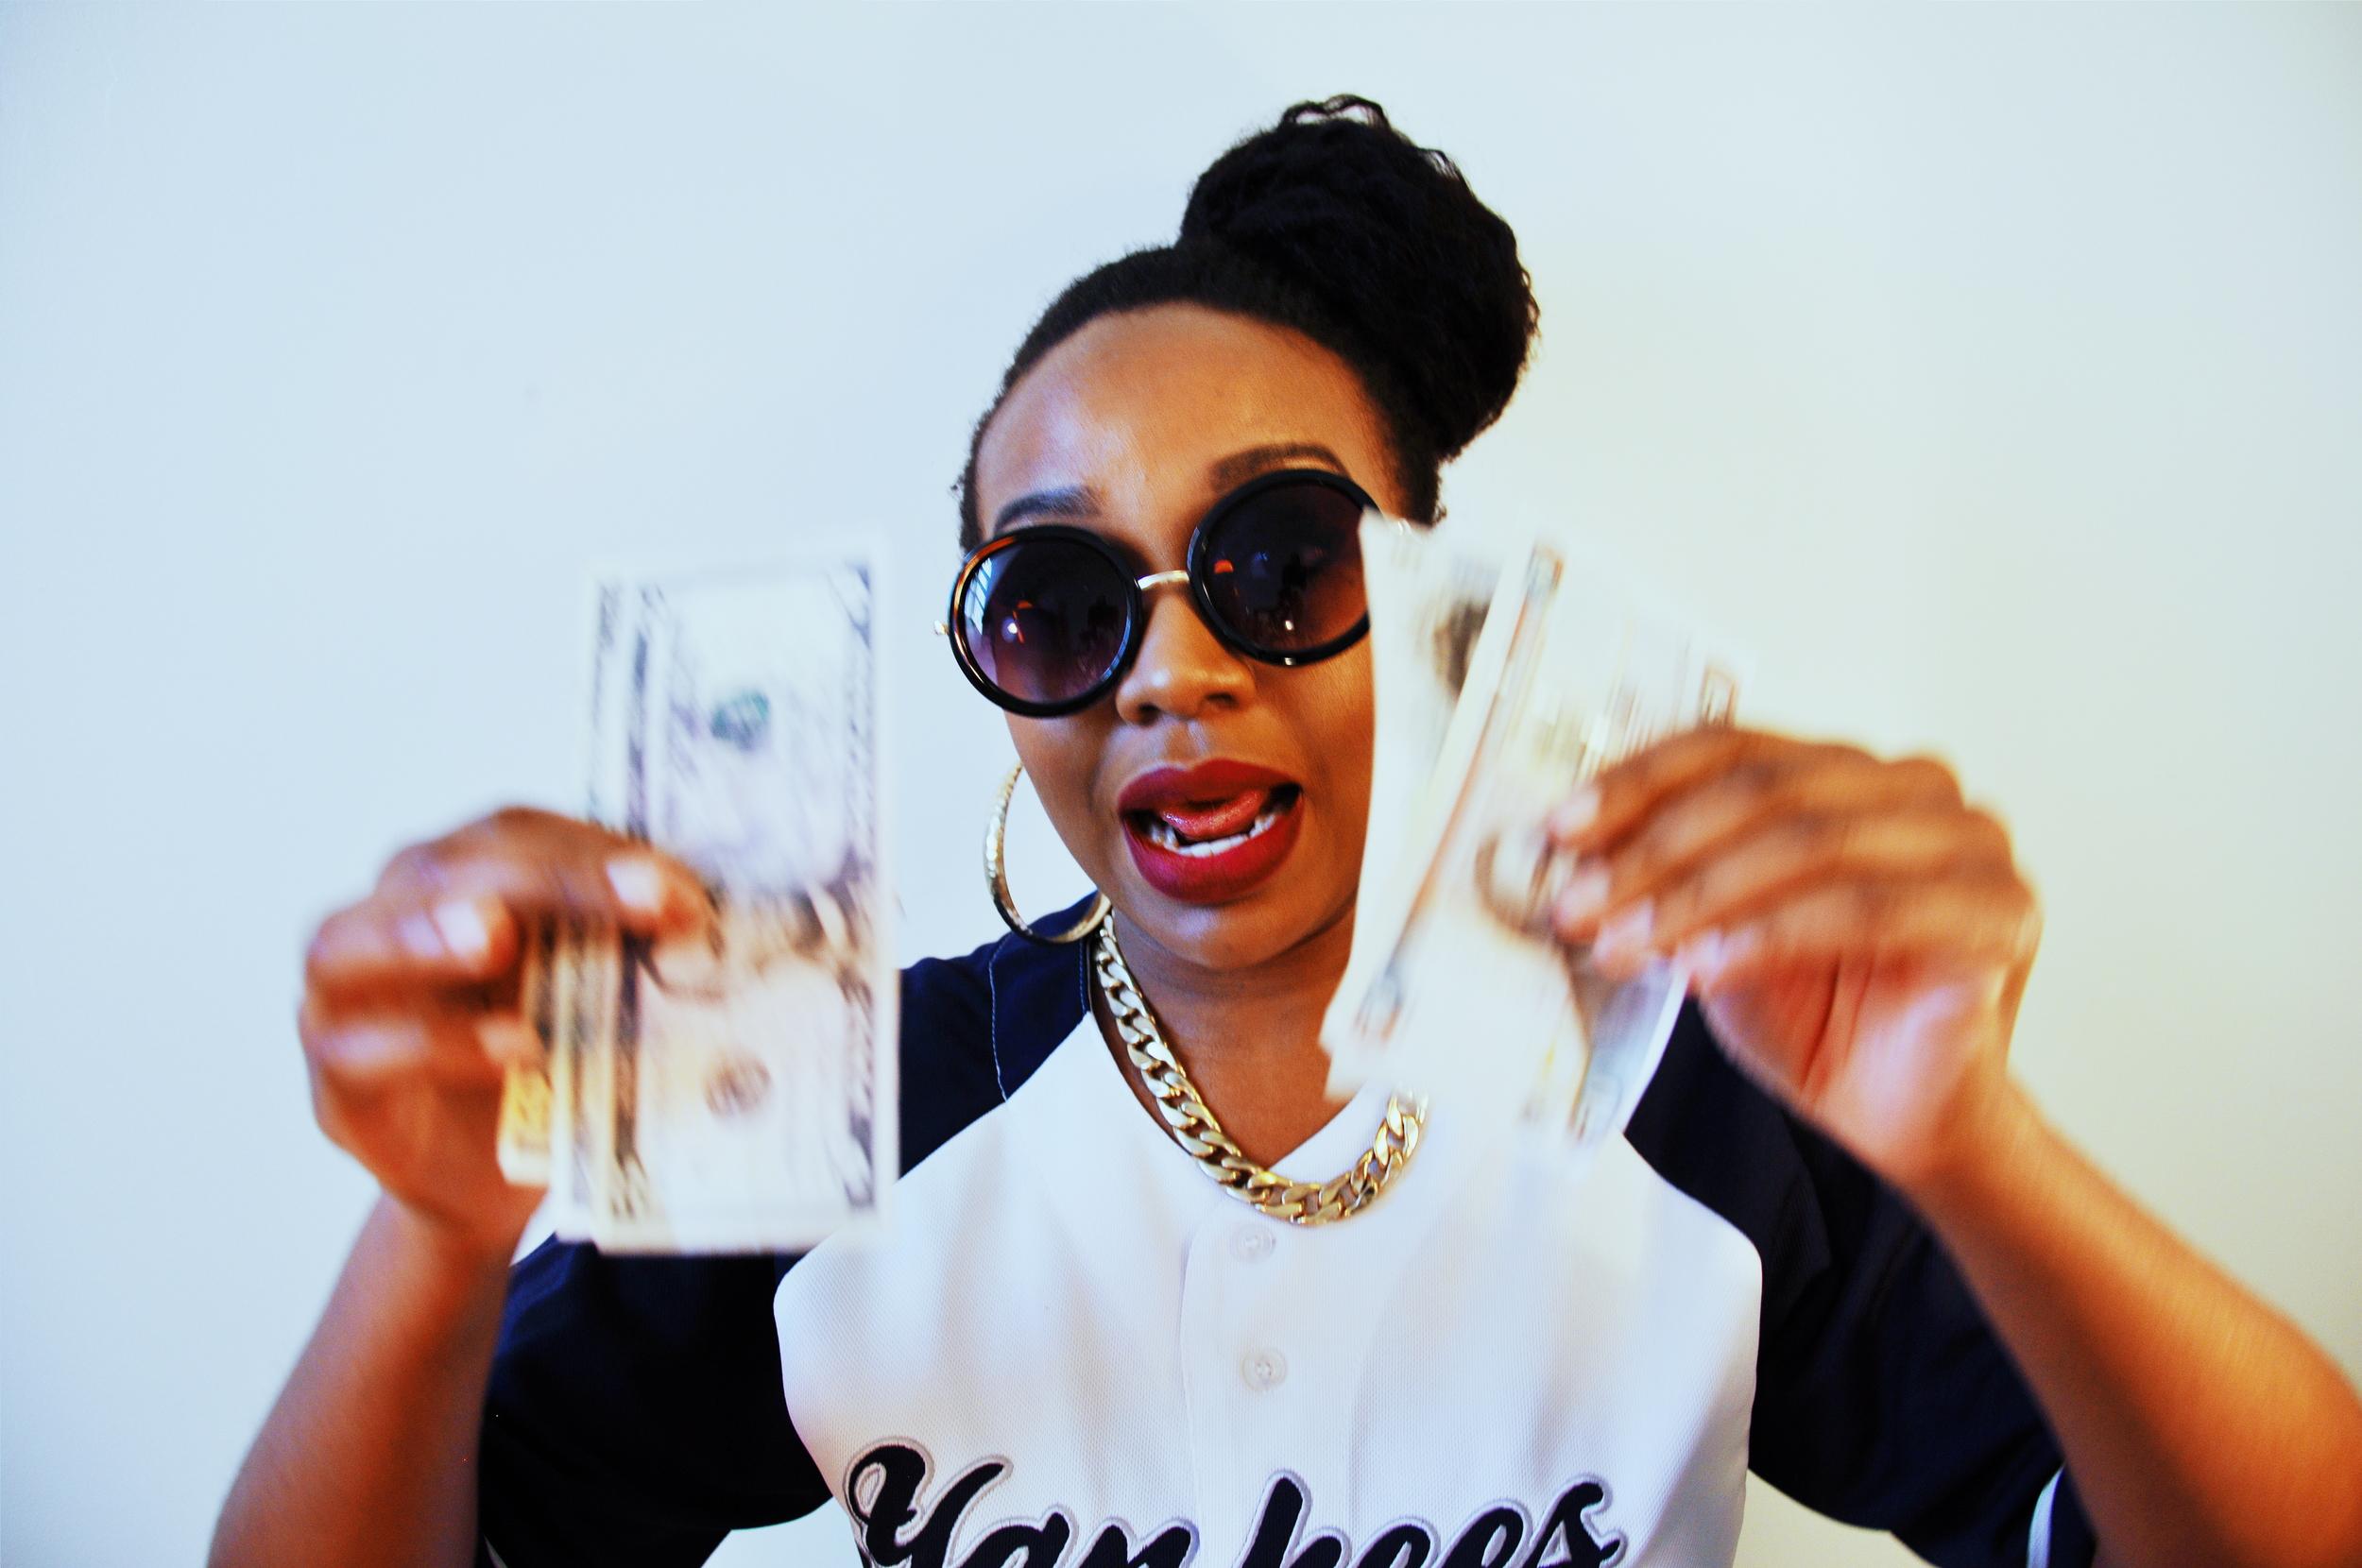 I GO CHOP MY OWN MONEY LIKE A BOSSLADY, SO I THOUGHT!